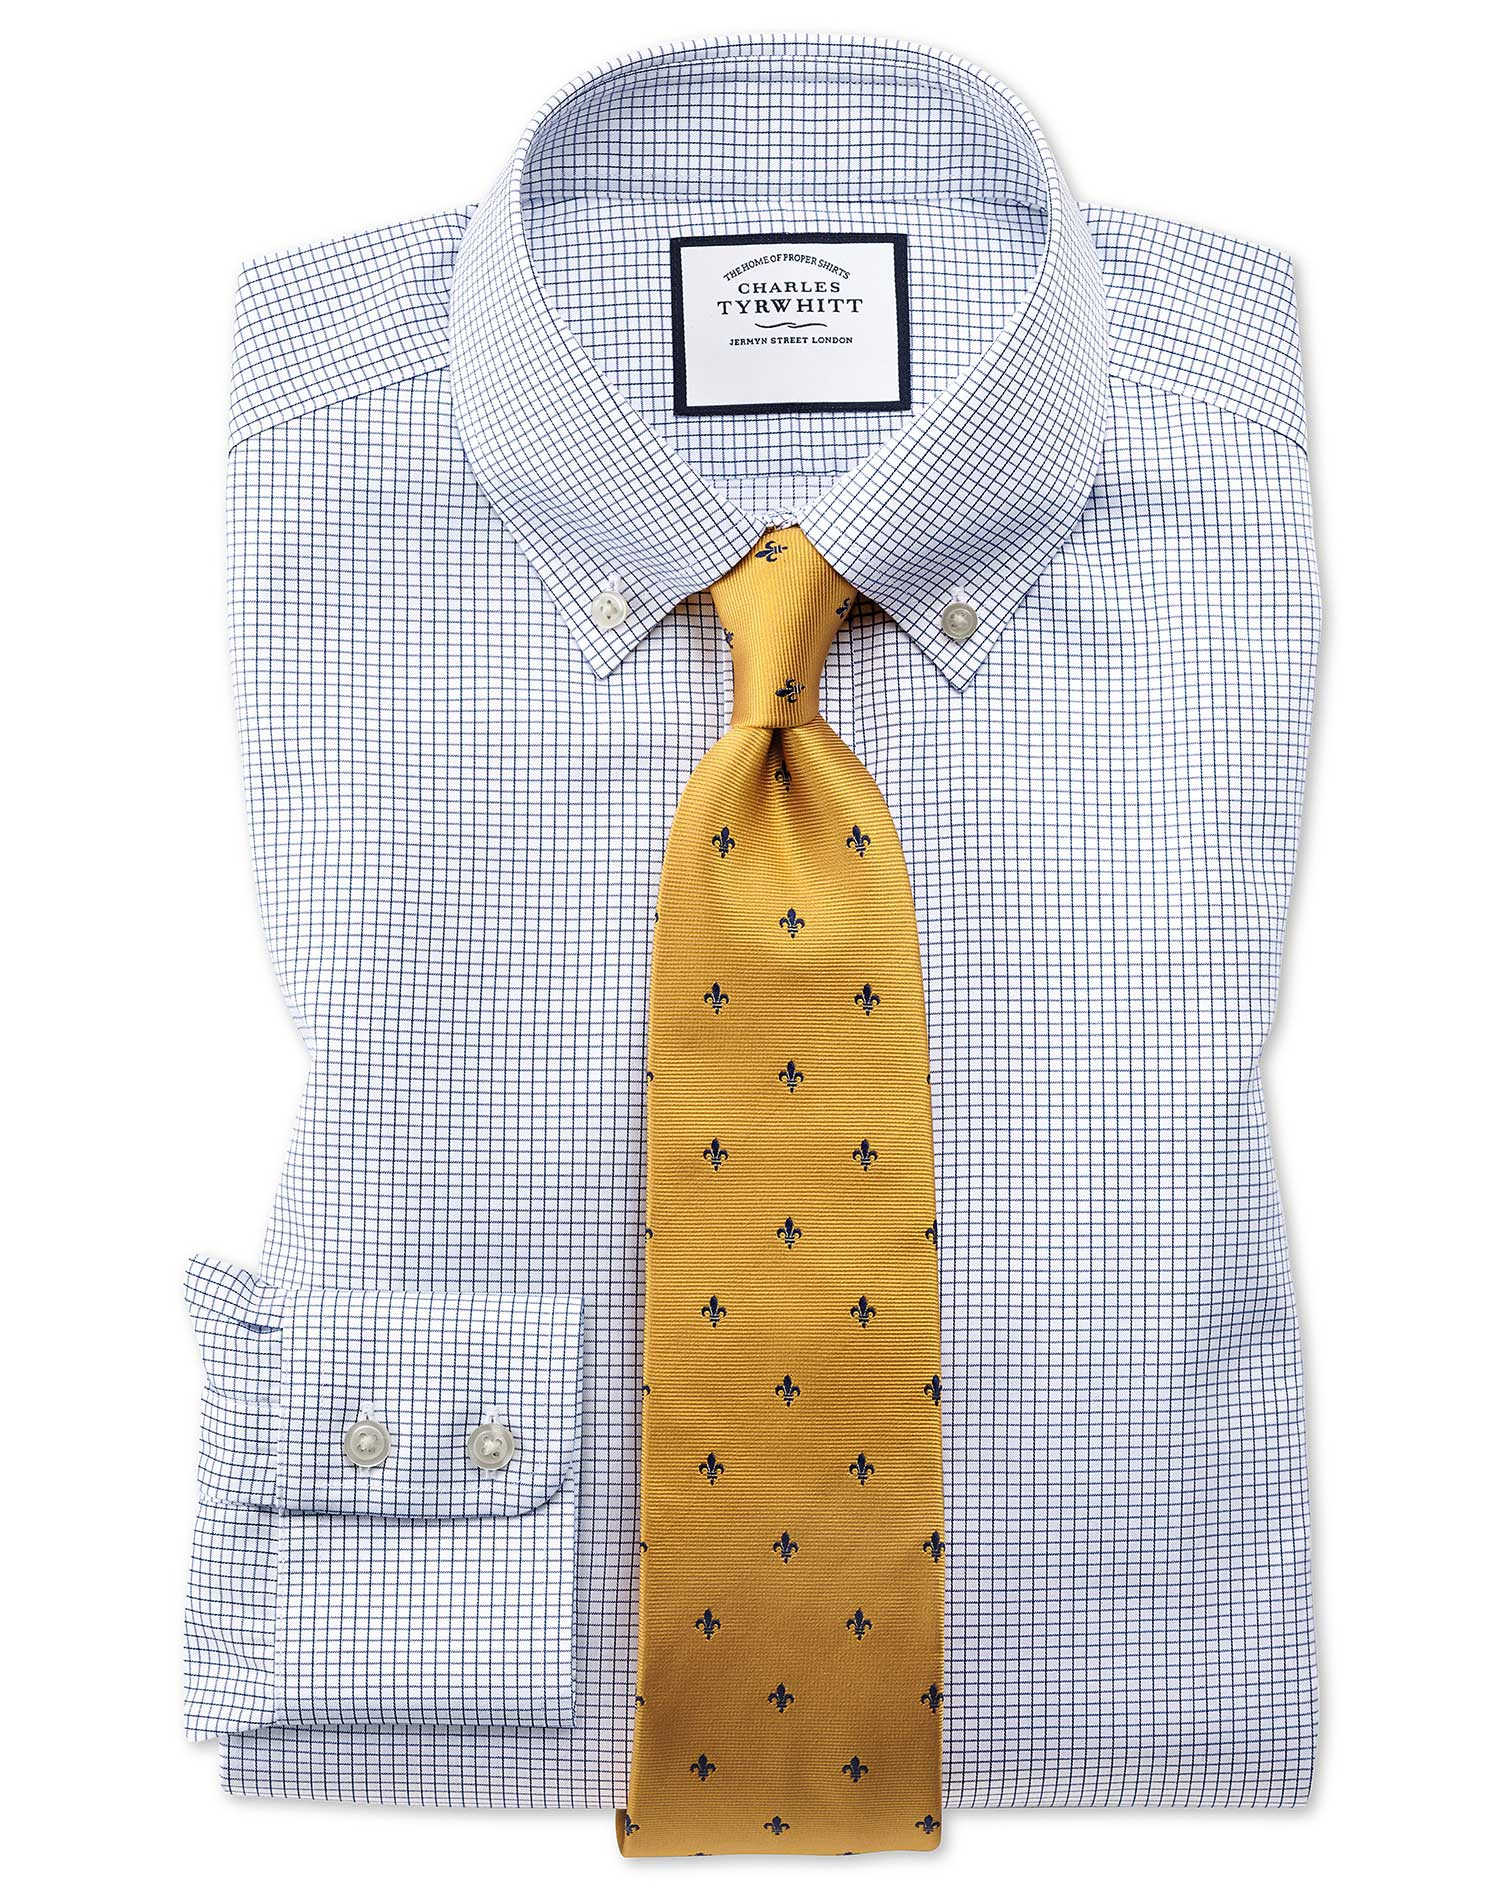 Slim Fit Button-Down Non-Iron Twill Mini Grid Check Navy Blue Cotton Formal Shirt Single Cuff Size 1